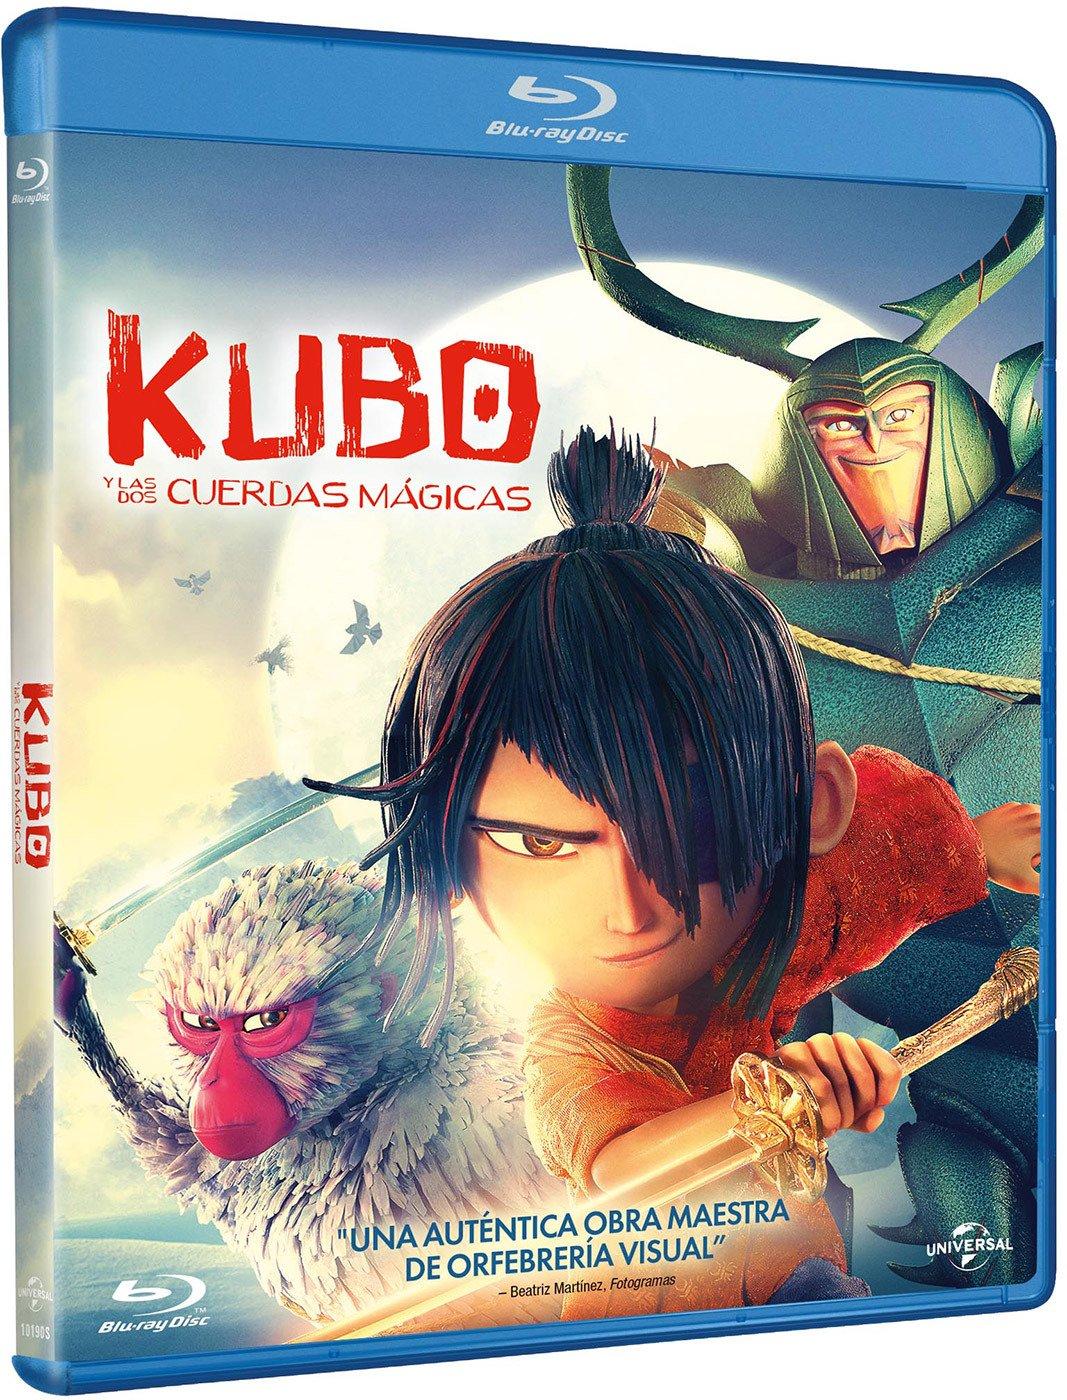 Kubo Blu-Ray